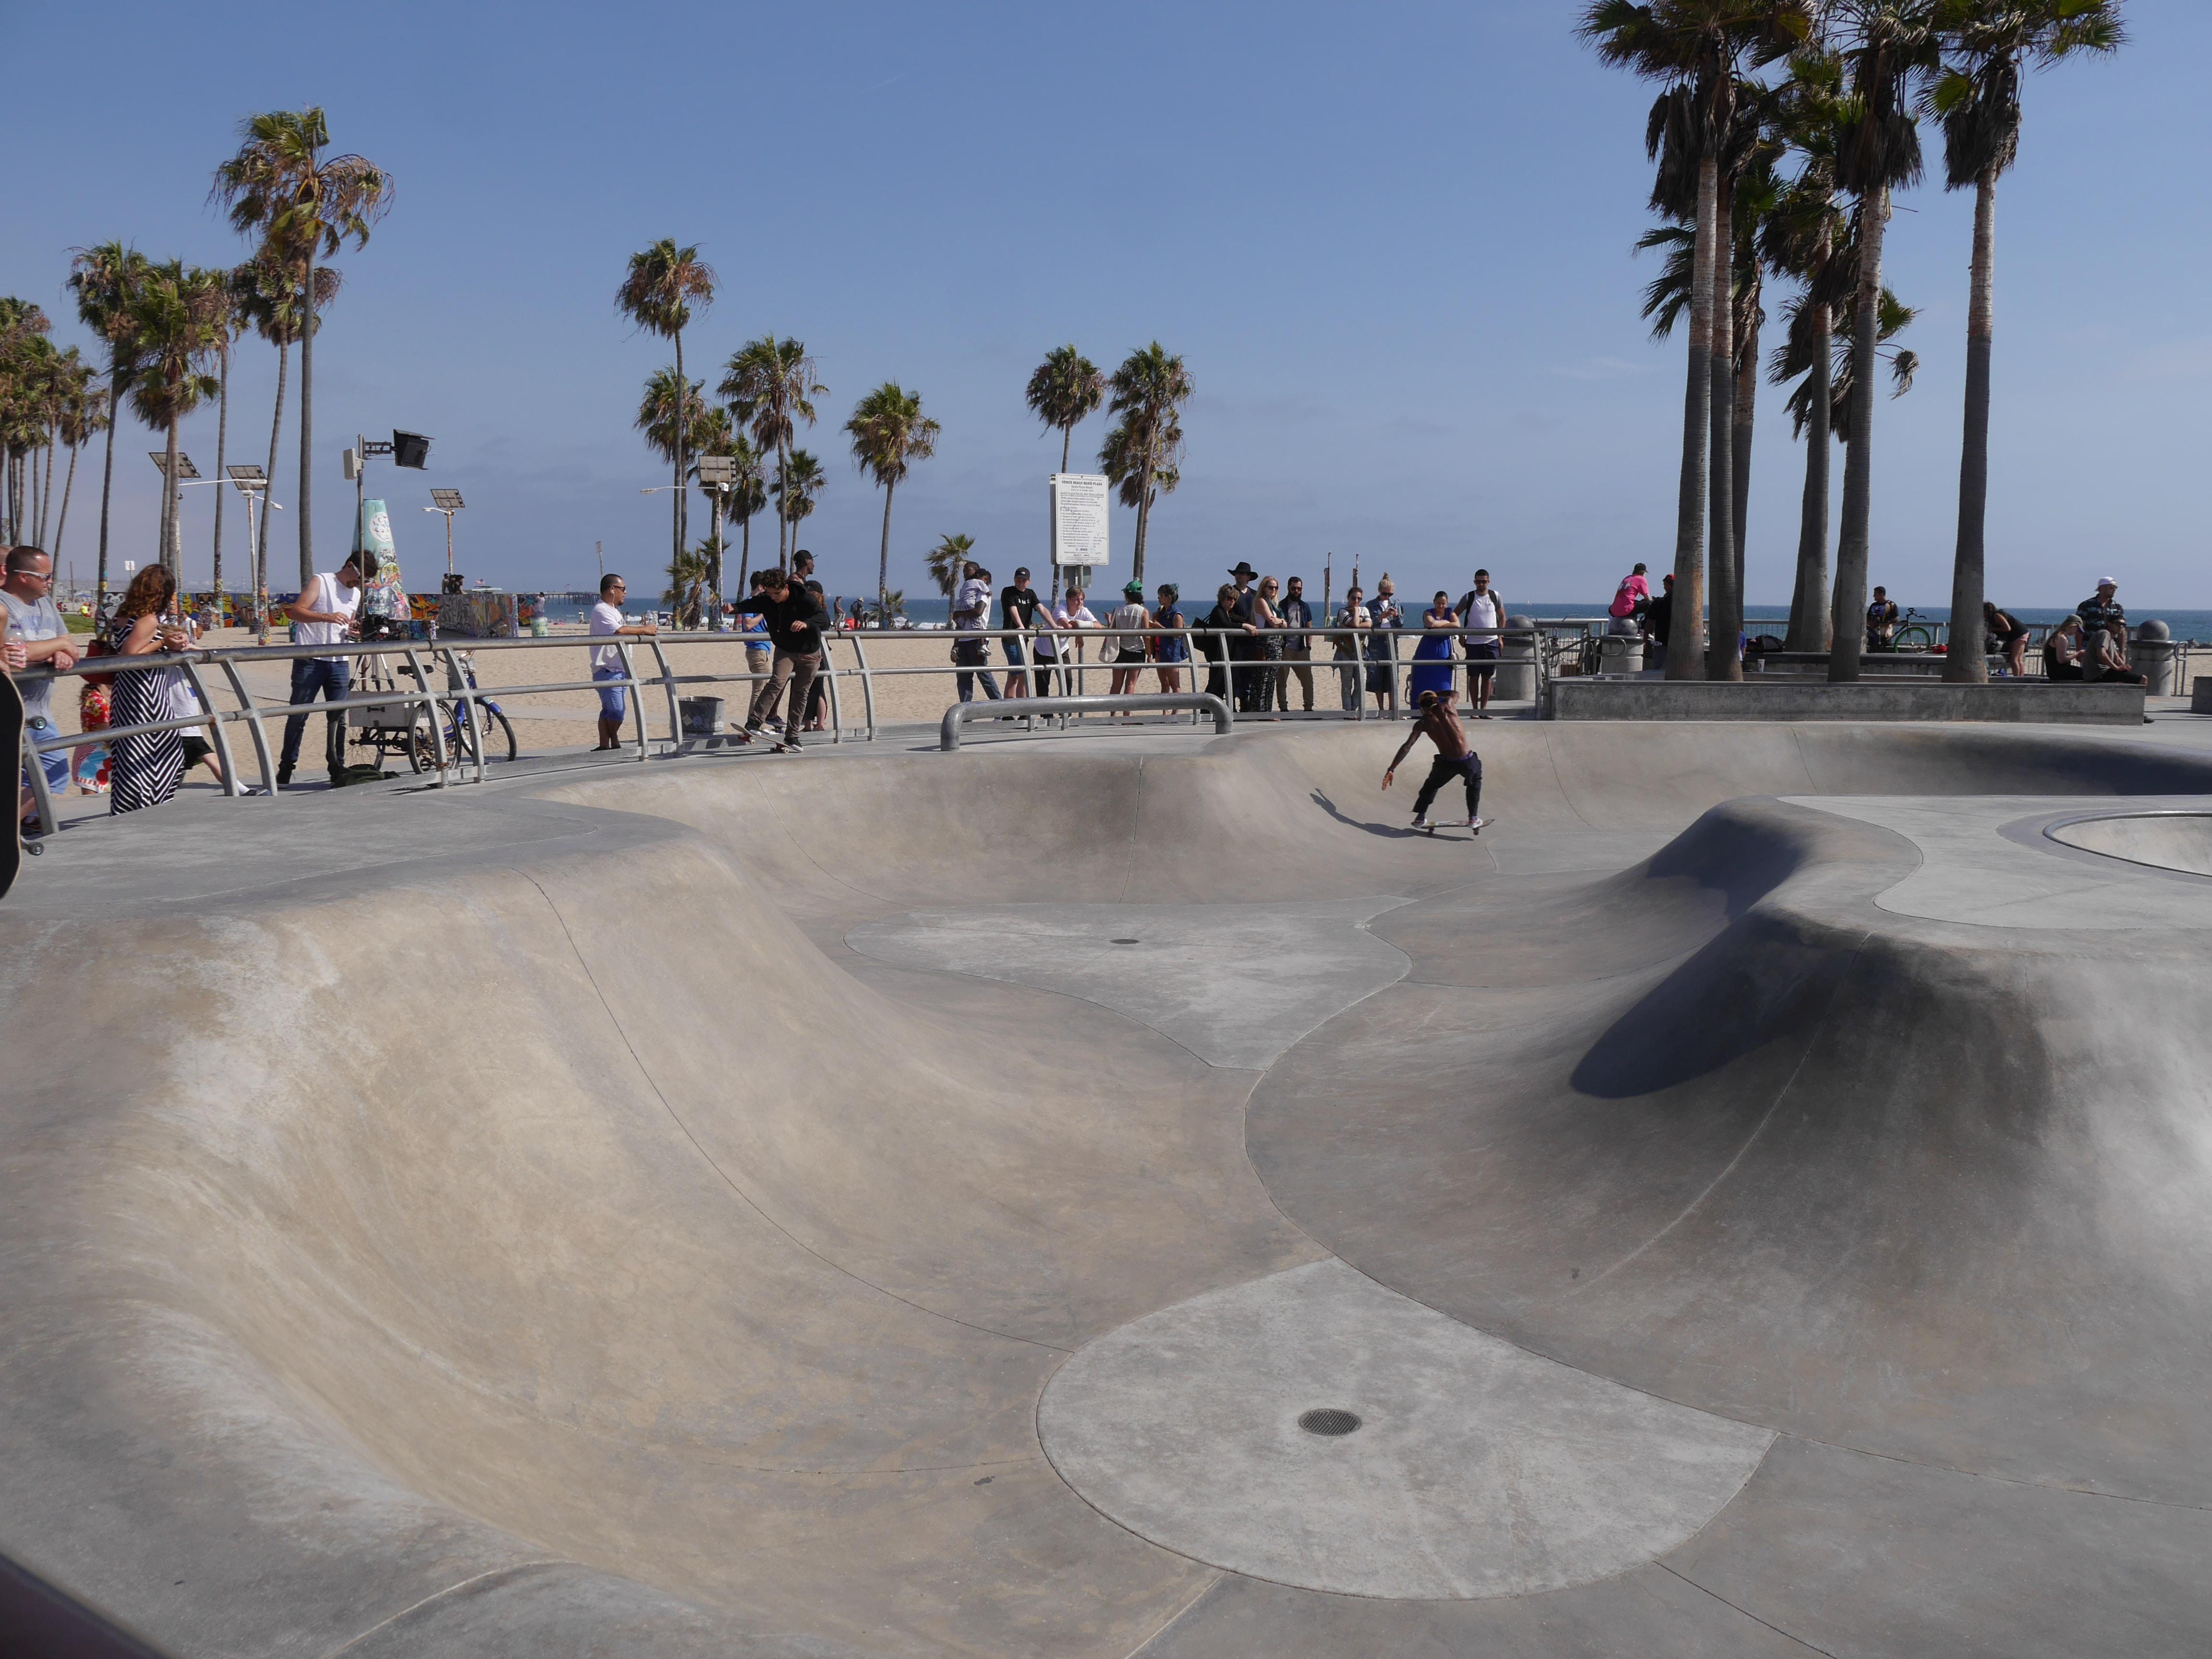 man skateboarding on park near coconut trees